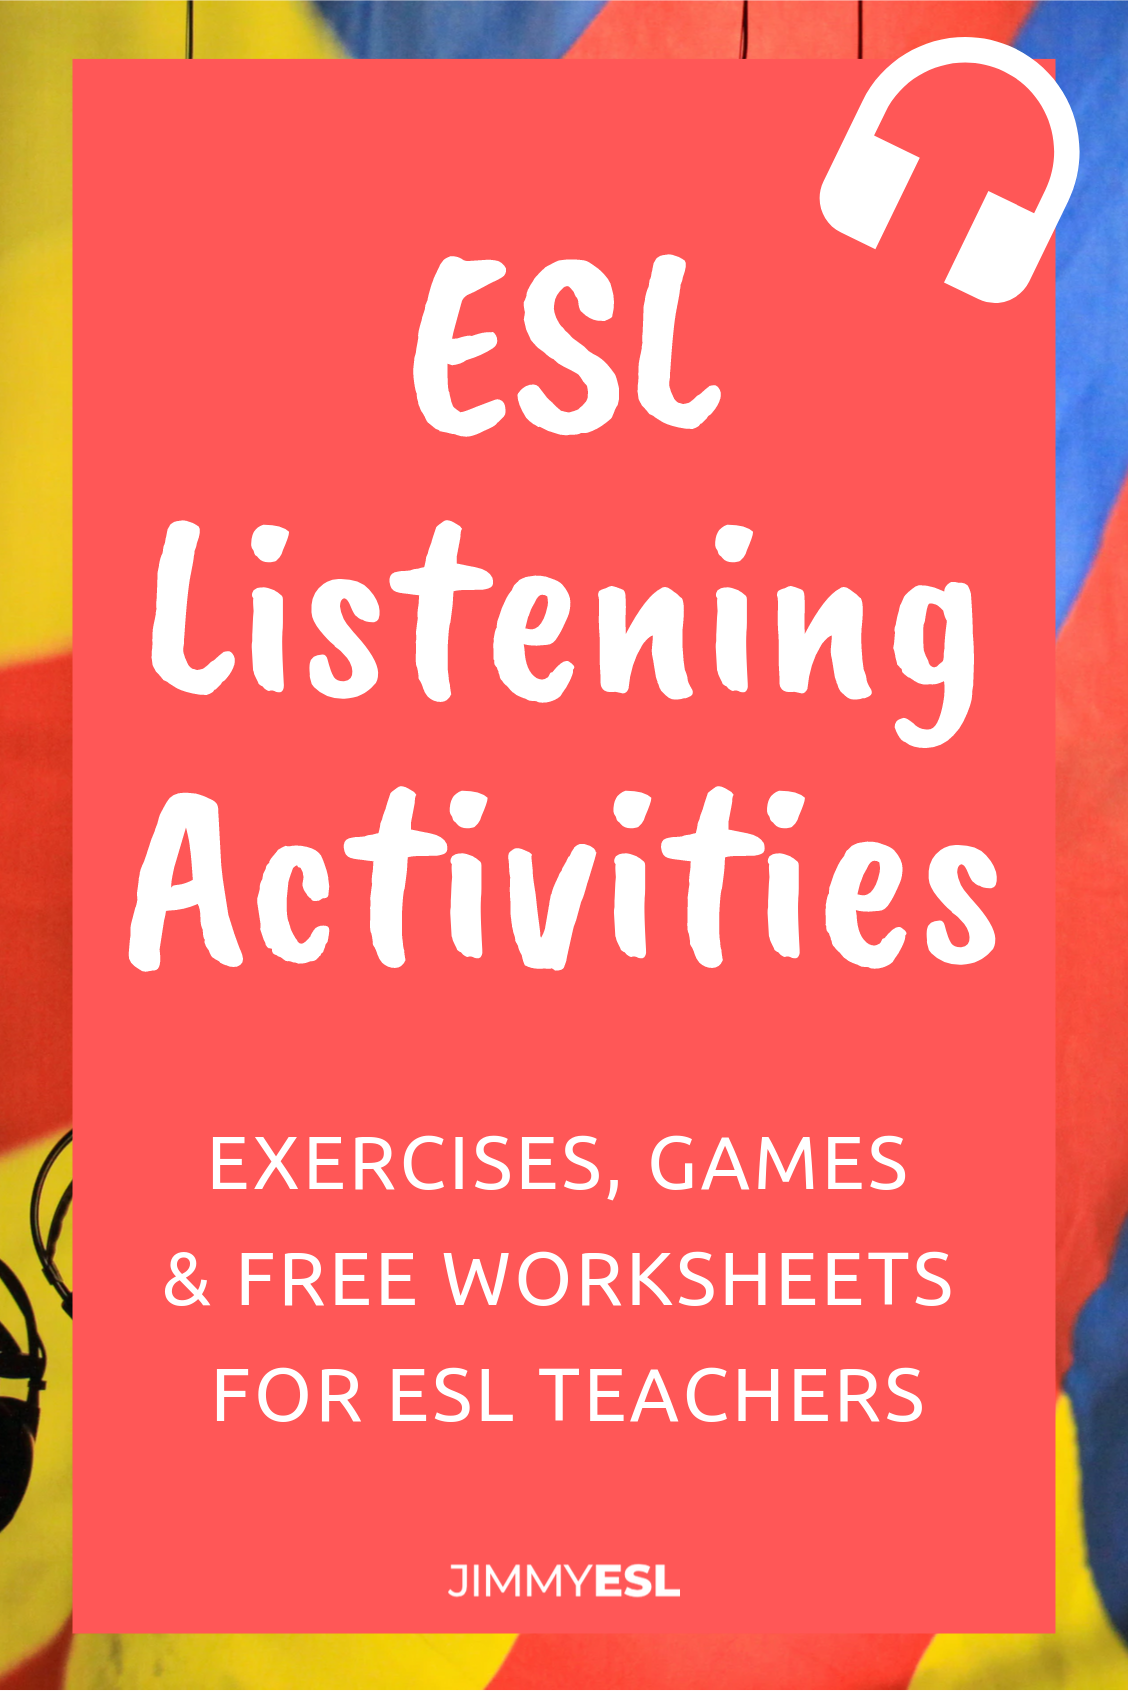 12 Great Esl Listening Activities Games Plus Free Worksheets Jimmyesl Esl Listening Activities Esl Lessons Esl Teaching Resources